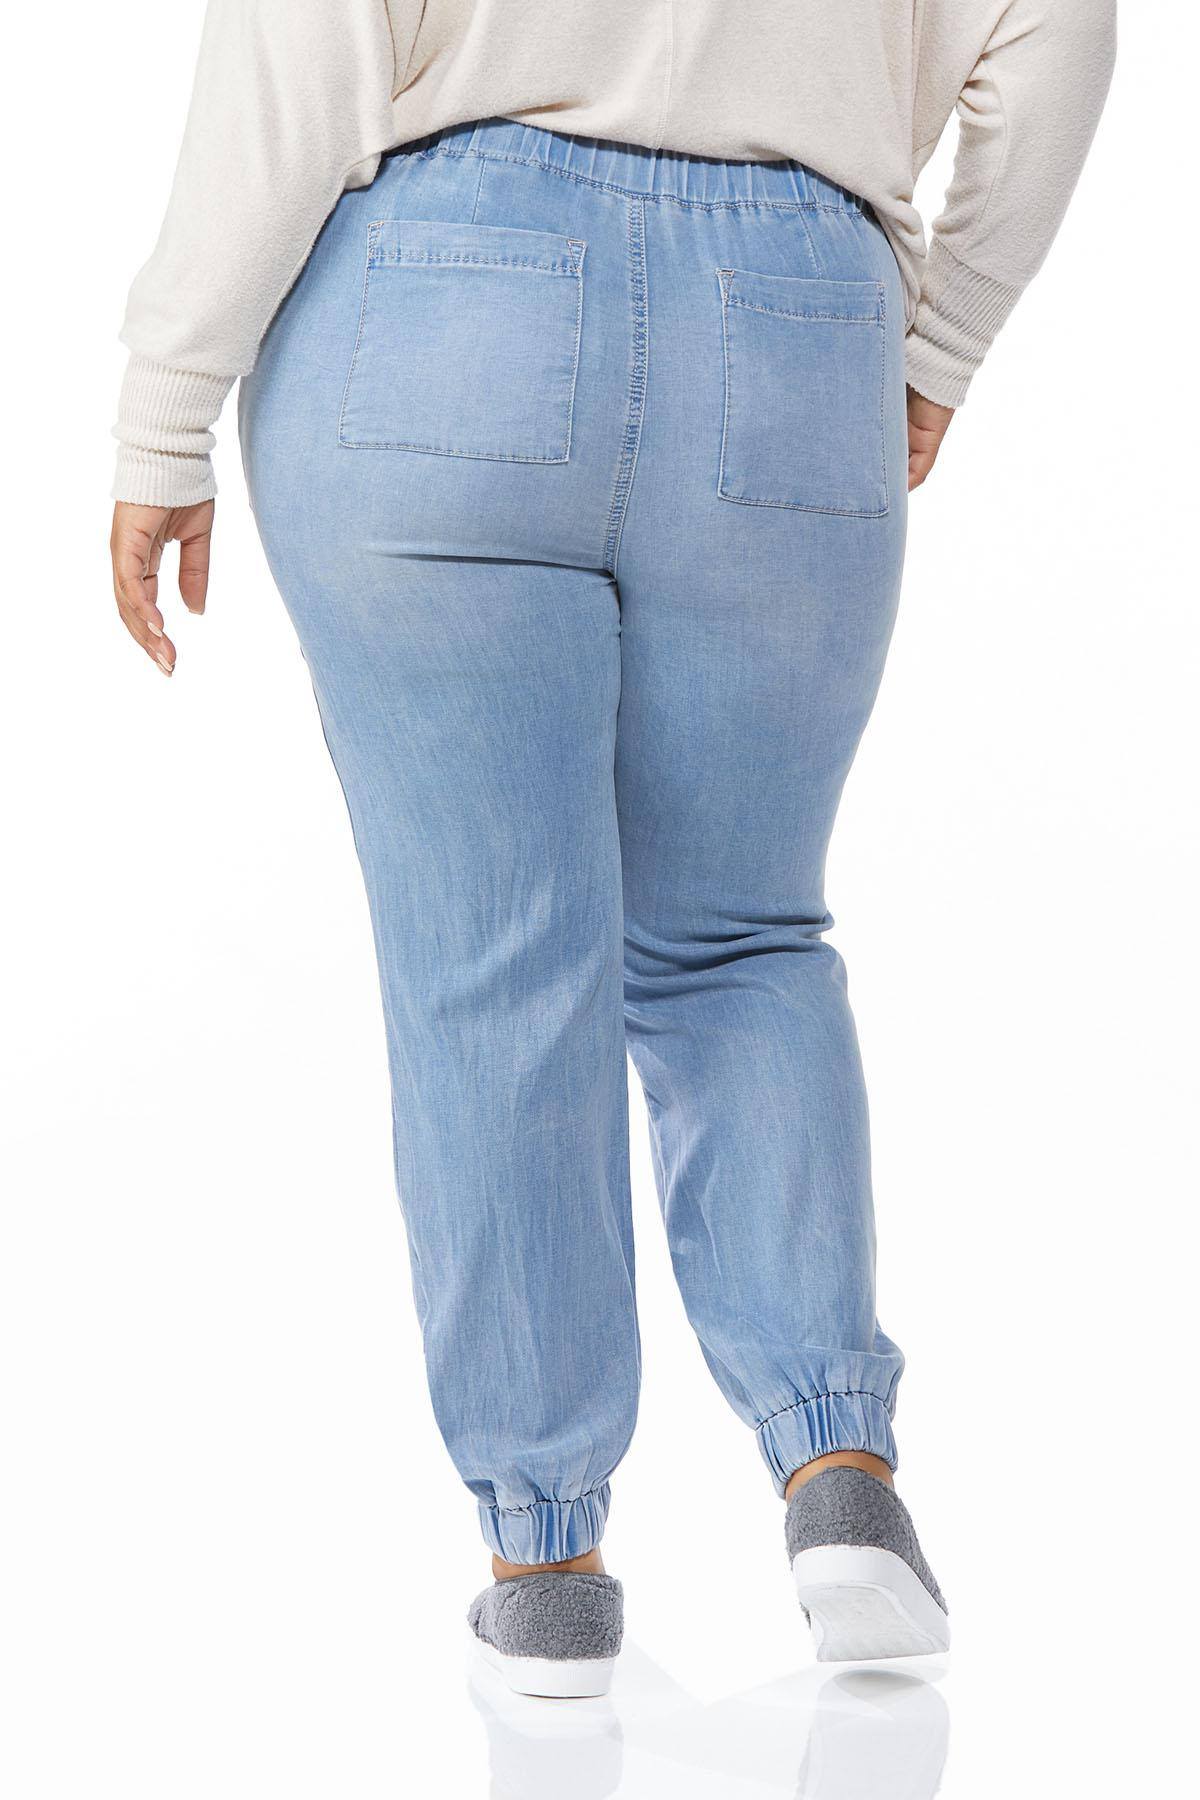 Plus Size Chambray Joggers (Item #44688326)